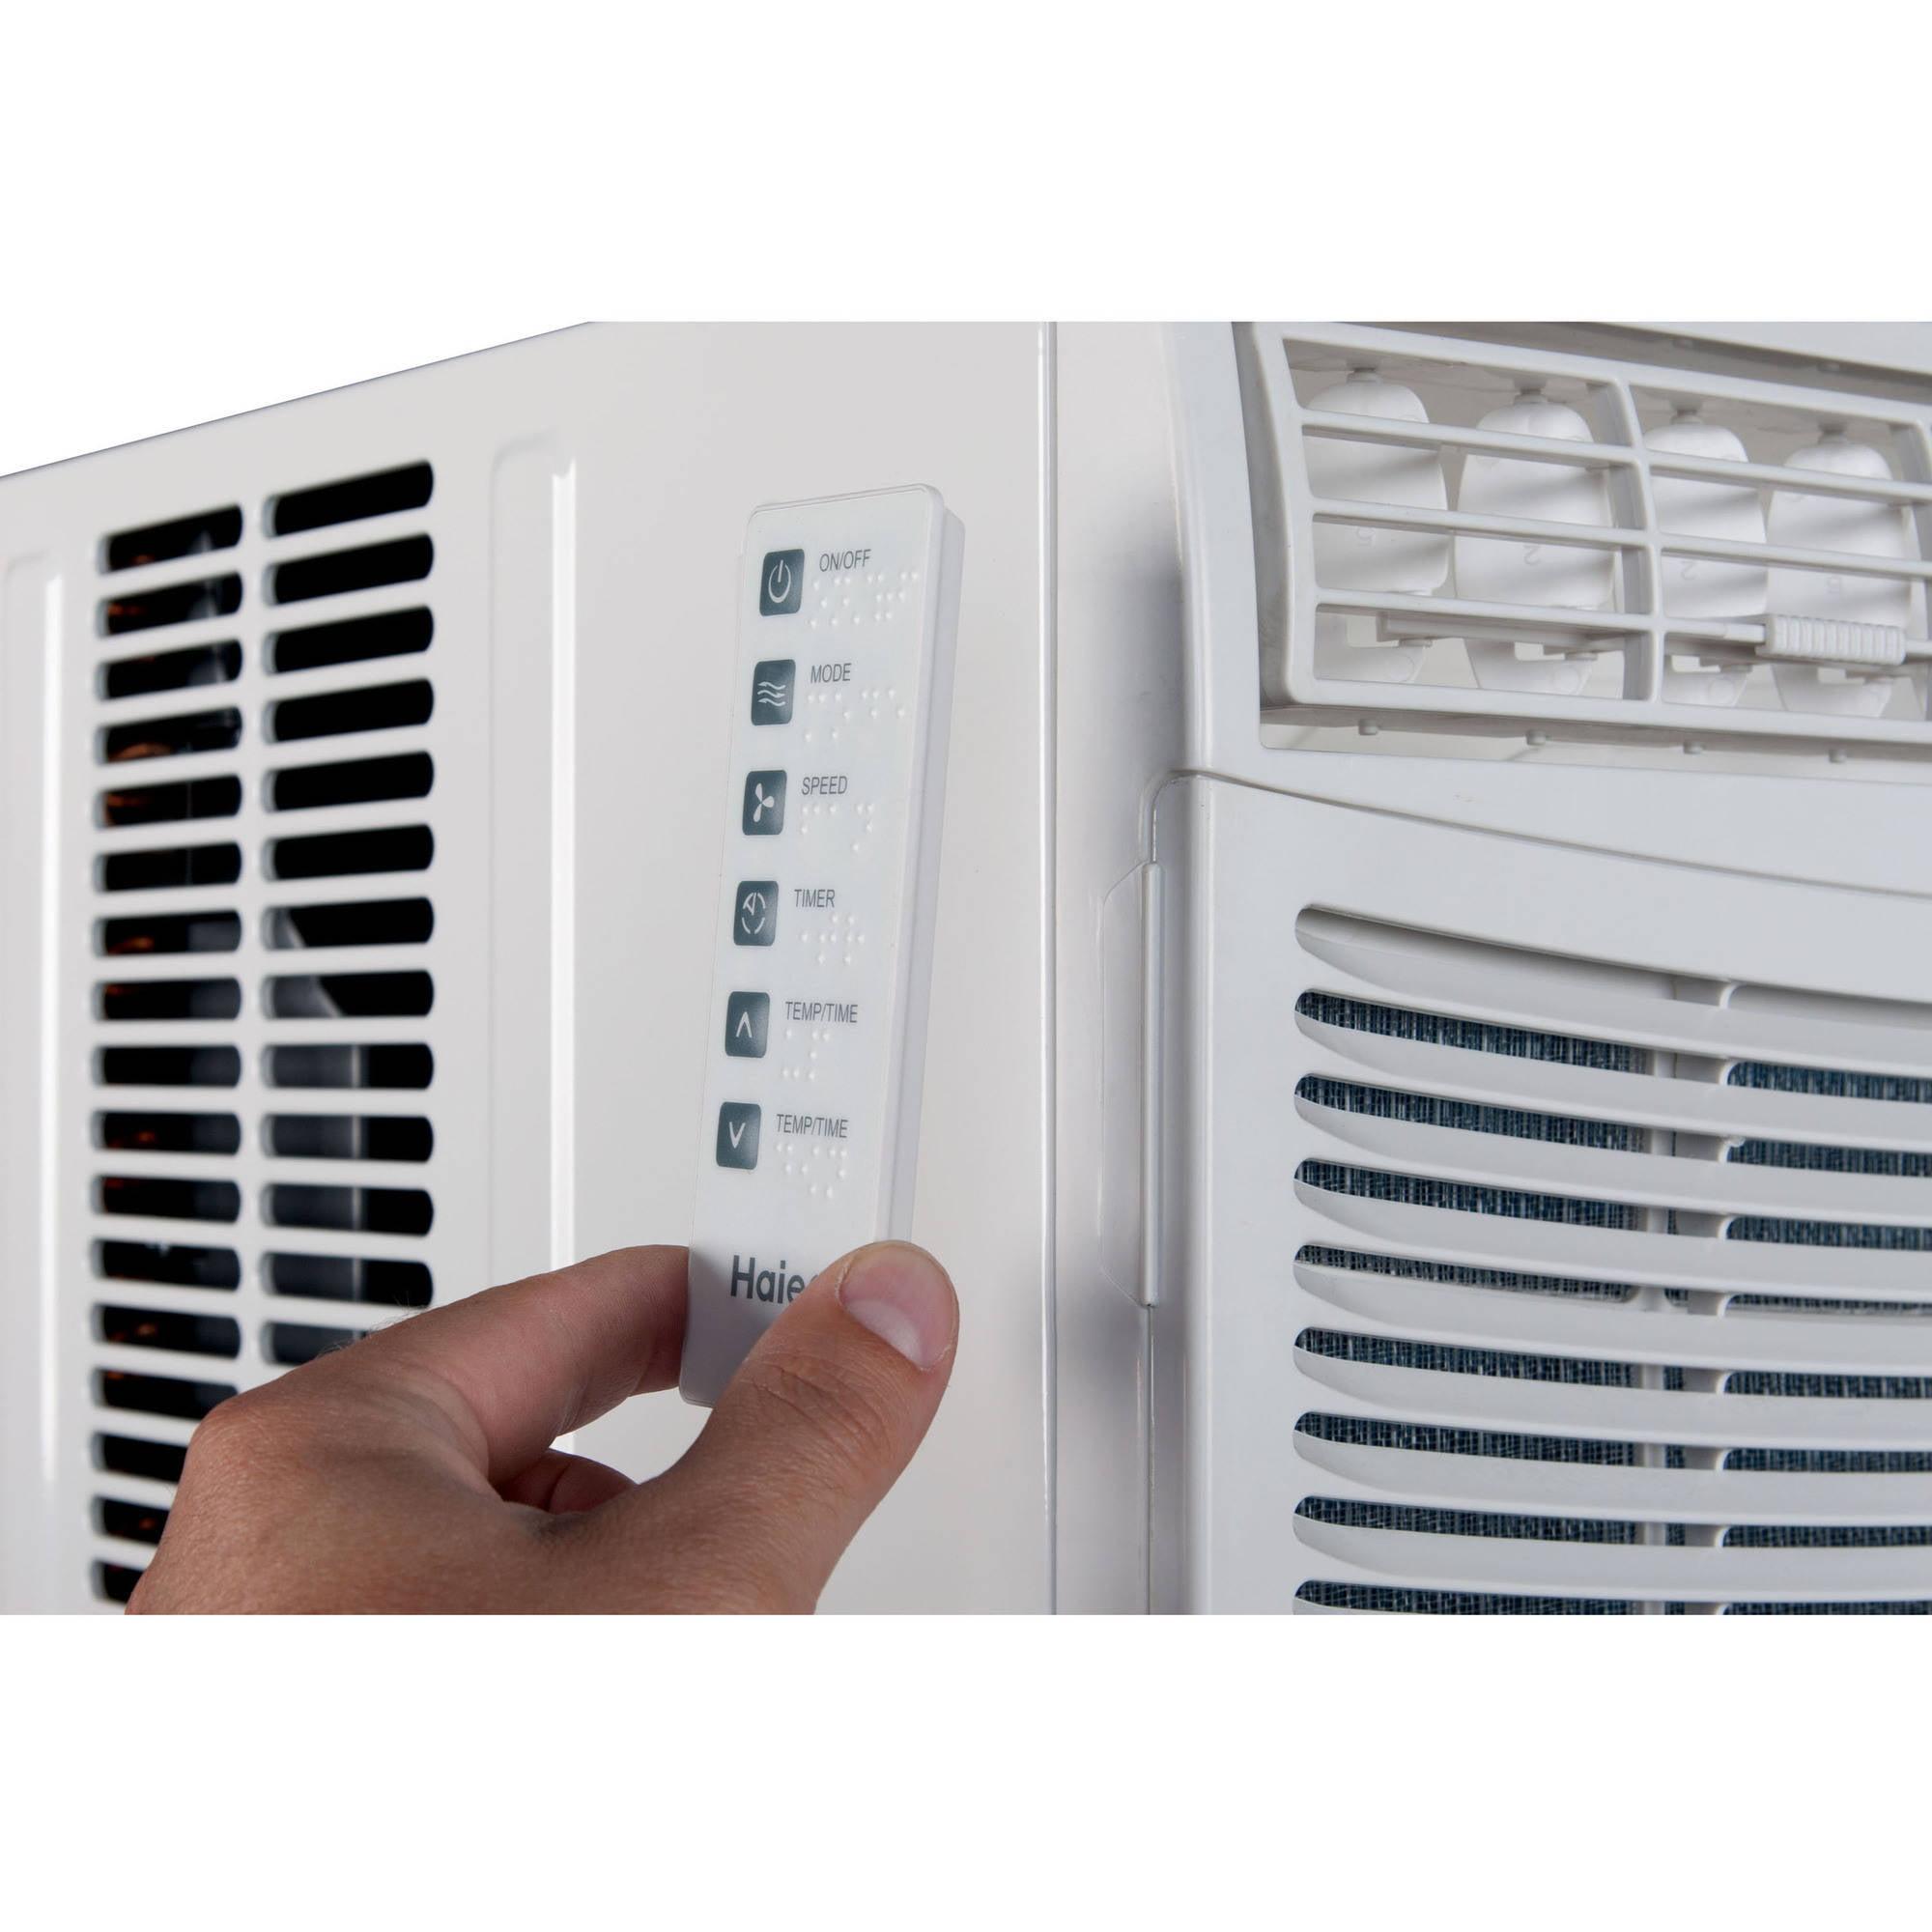 Haier HWE08XCR-LD 8,000 BTU 11.2 Ceer Electronic Control Air Conditioner -  Walmart.com